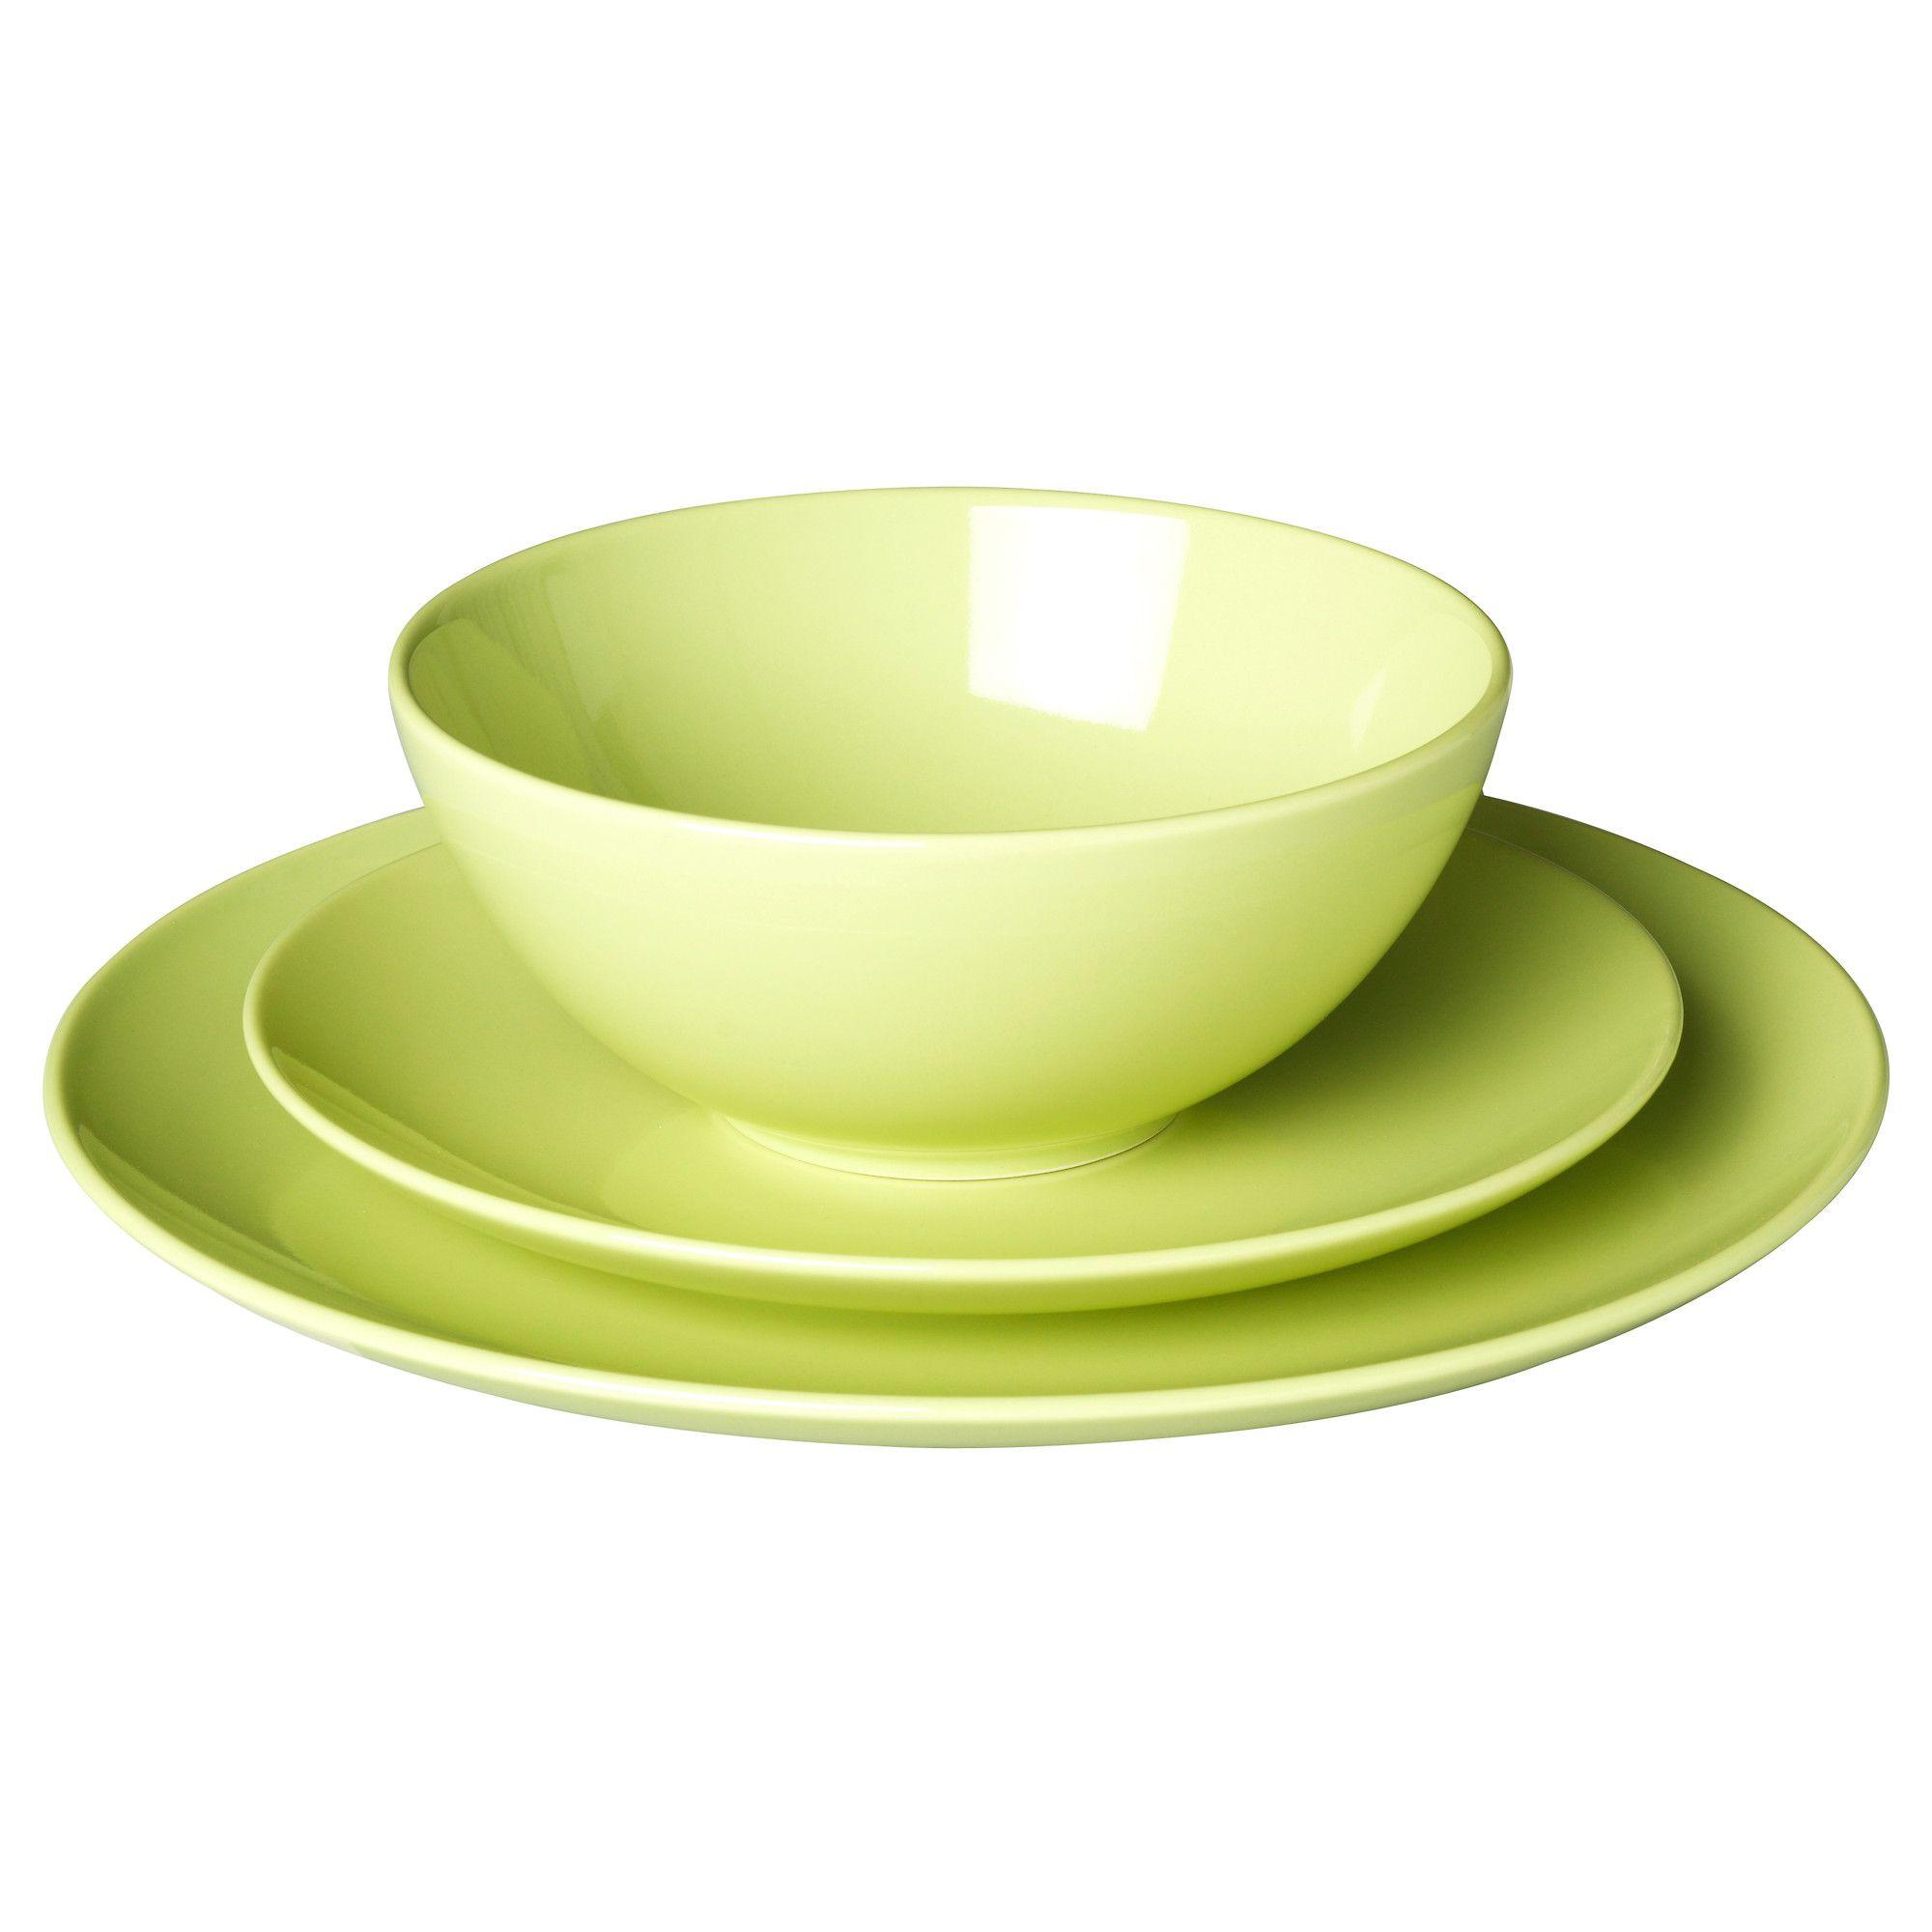 FÄRGRIK 18-piece dinnerware set - green/stoneware - IKEA got these for lunchroom  sc 1 st  Pinterest & FÄRGRIK 18-piece dinnerware set - green/stoneware - IKEA got these ...